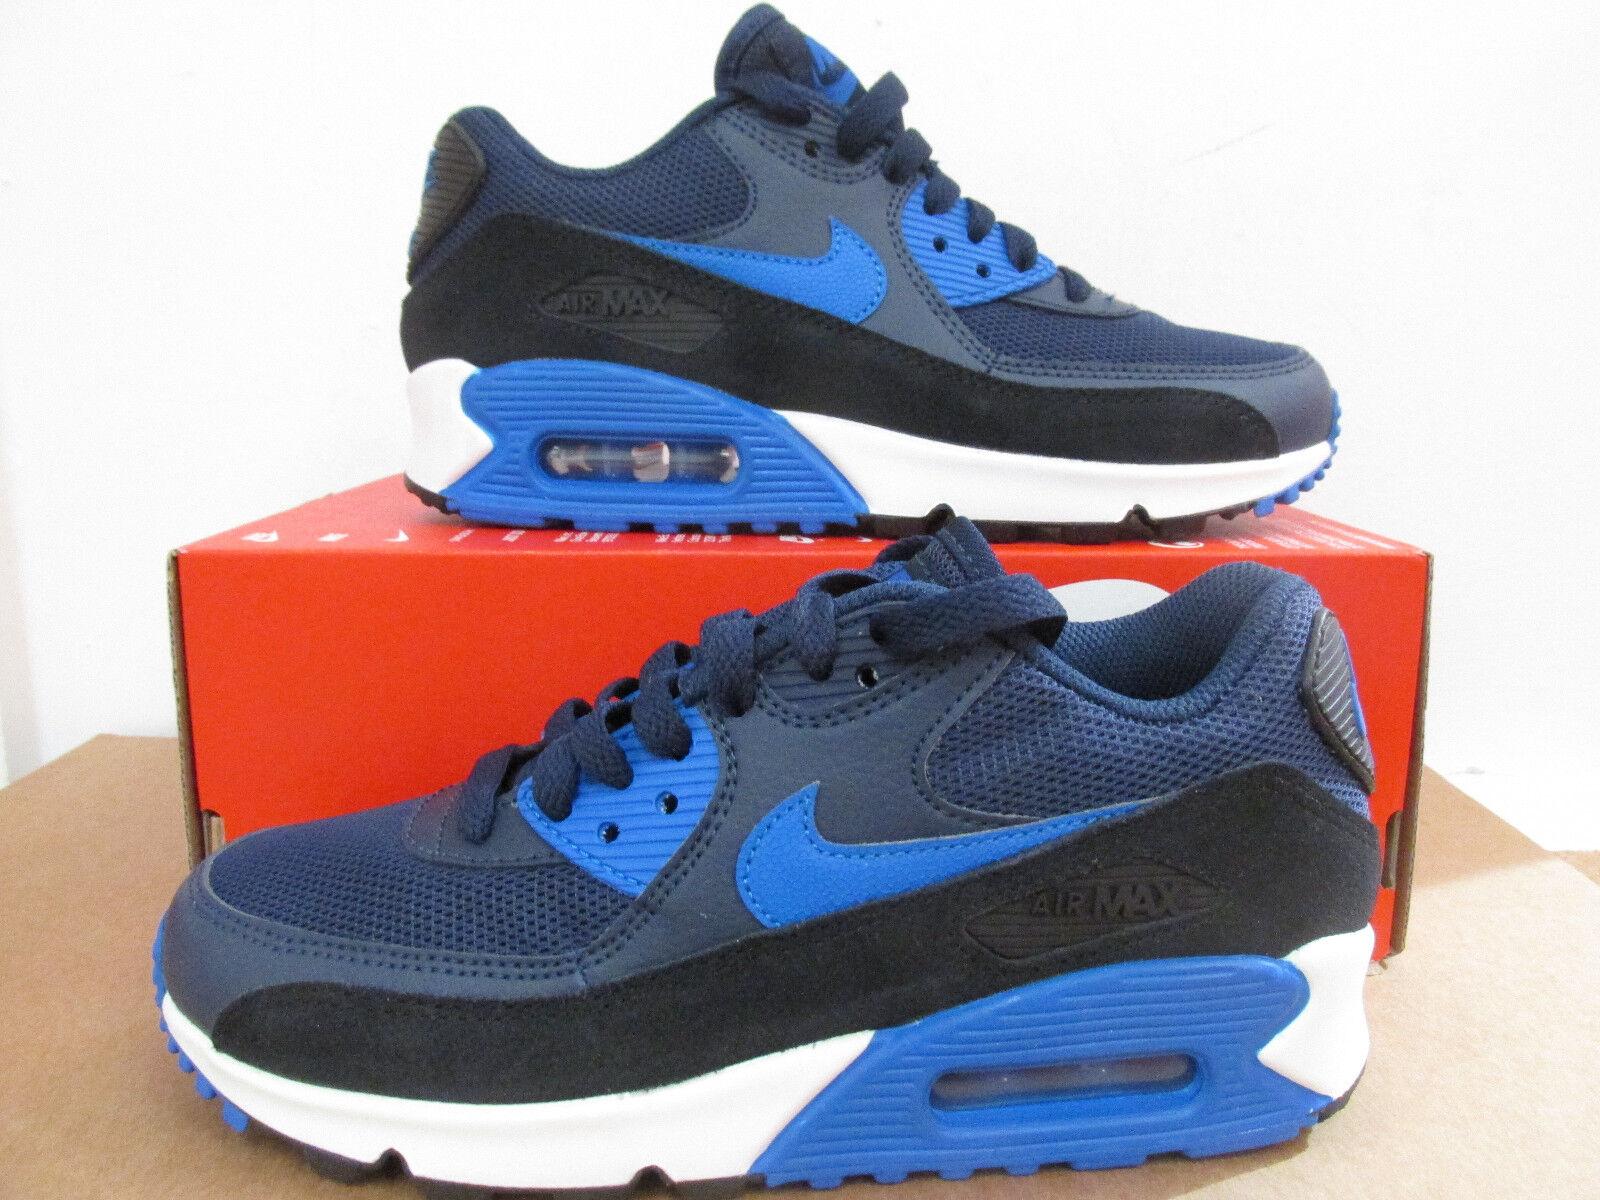 Para Essential mujer Nike Air Max Essential Para 616730 401 Tenis Zapatos  aclaramiento f923b0